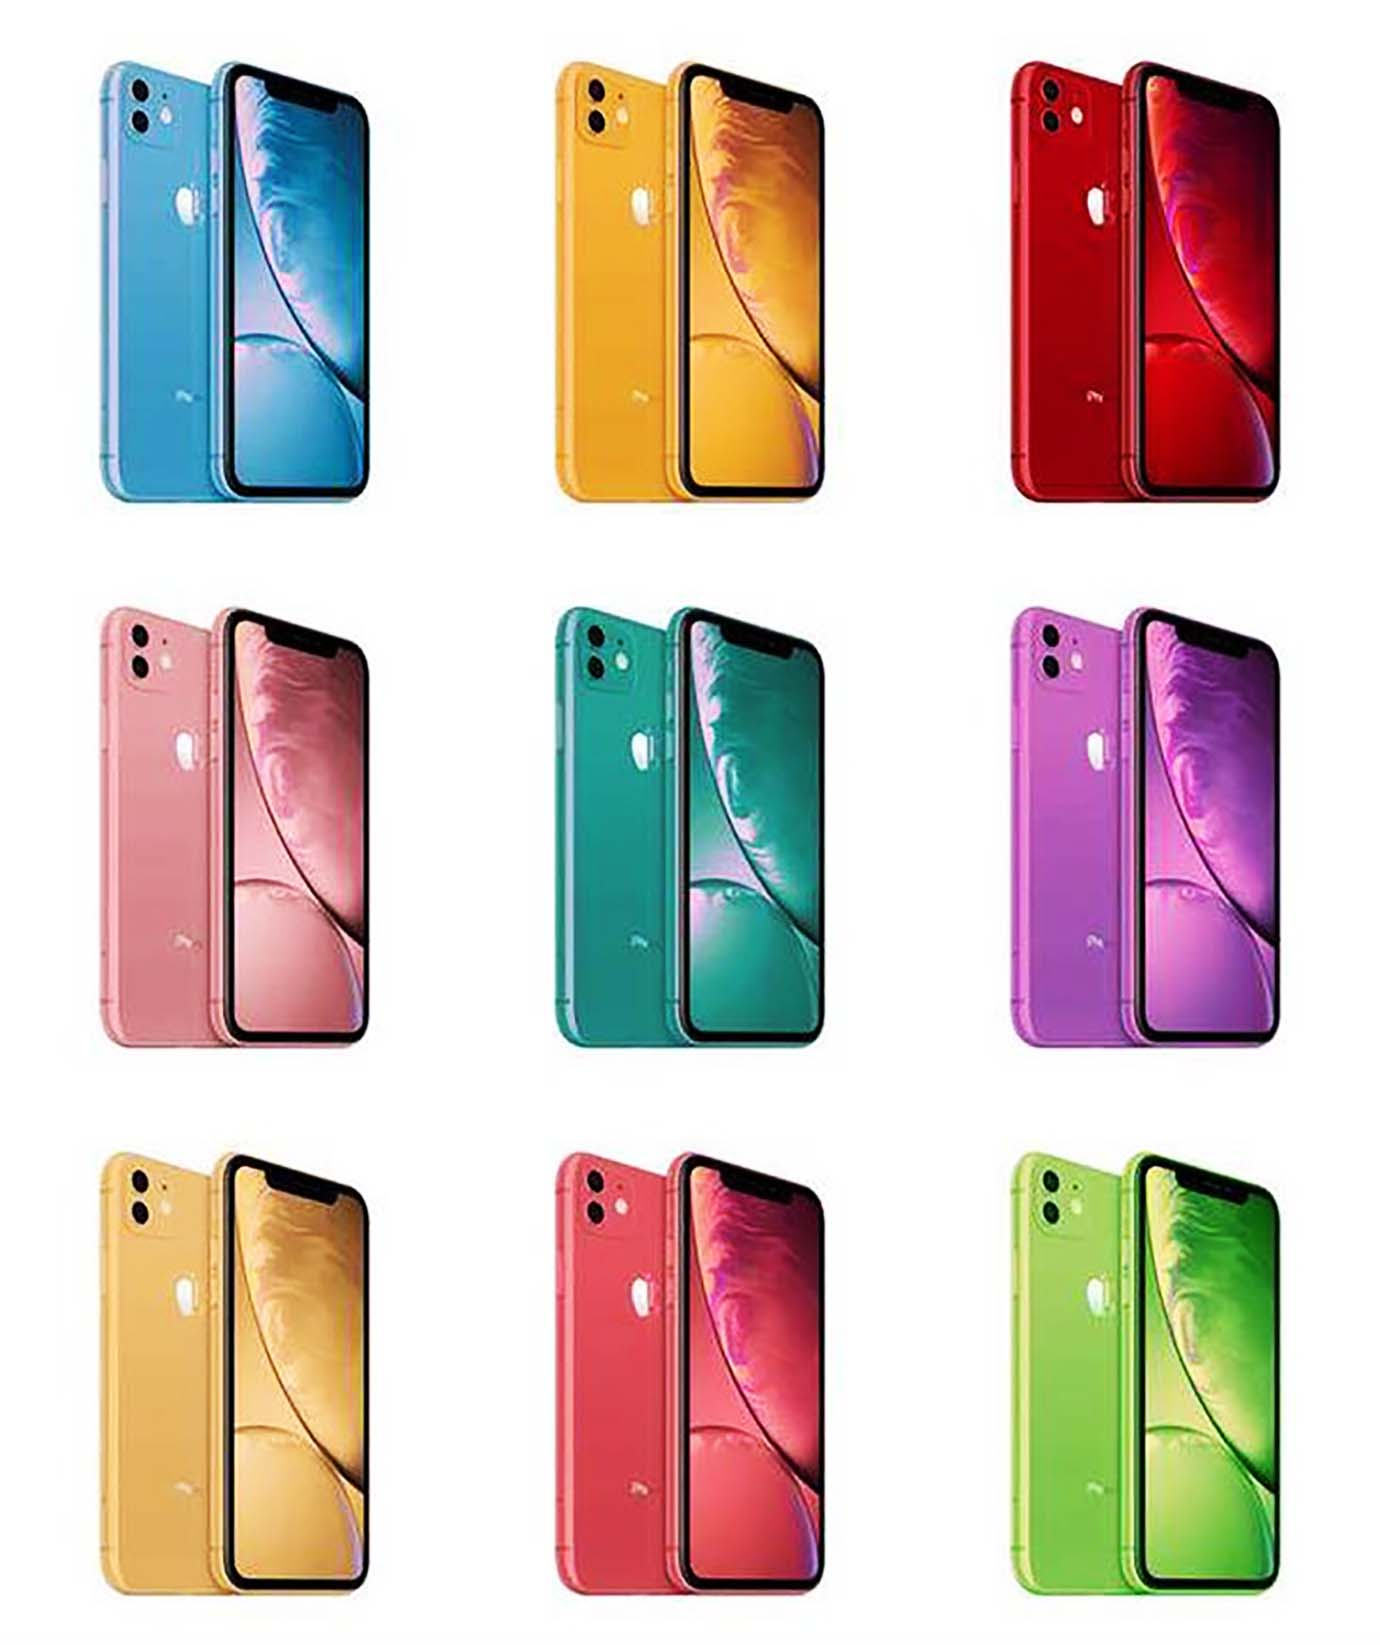 iphone11-iphonexi2